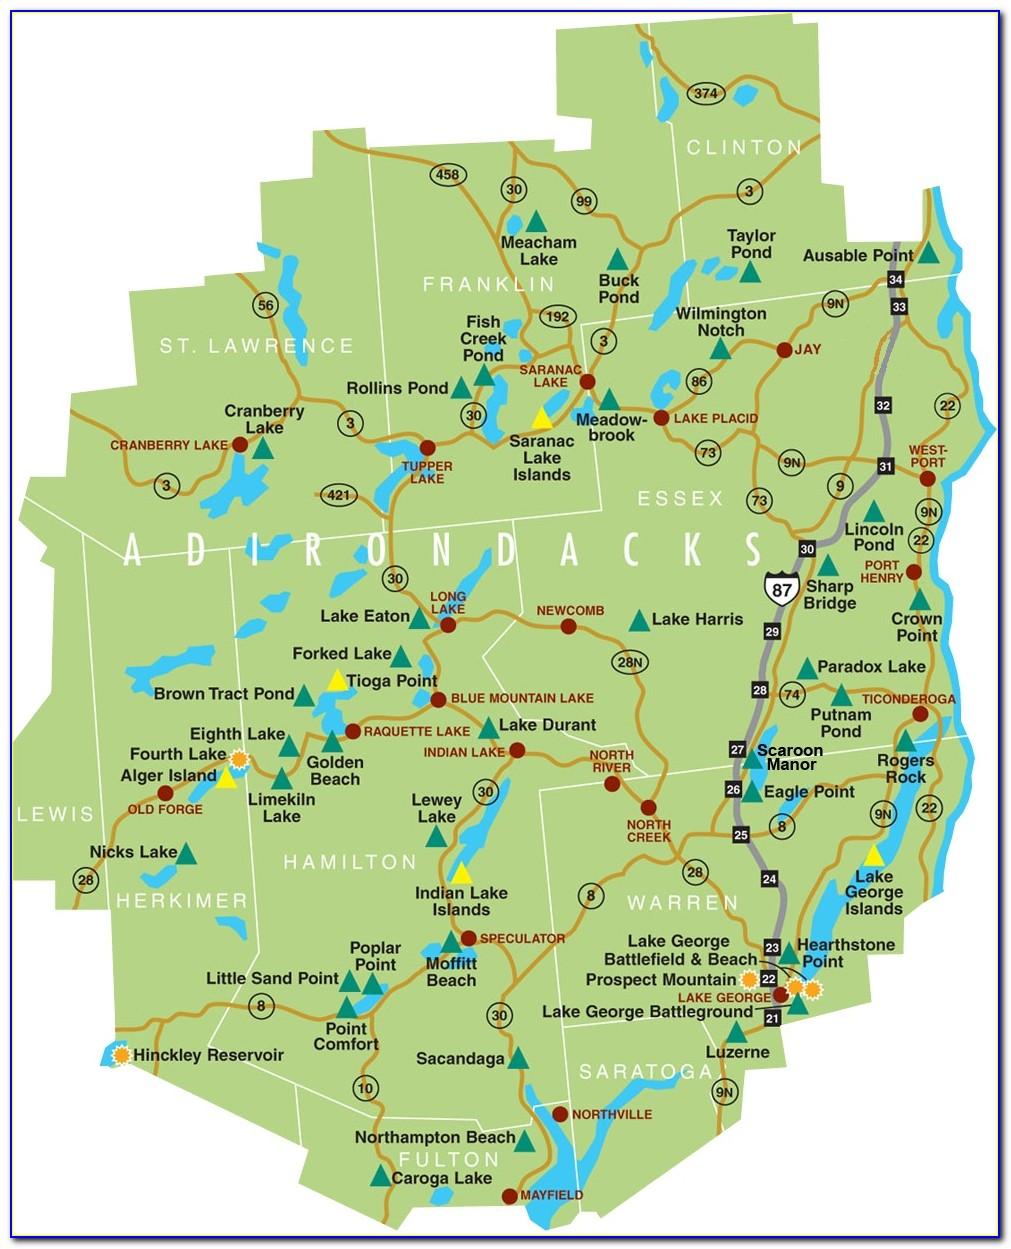 Map Of The Adirondacks In New York